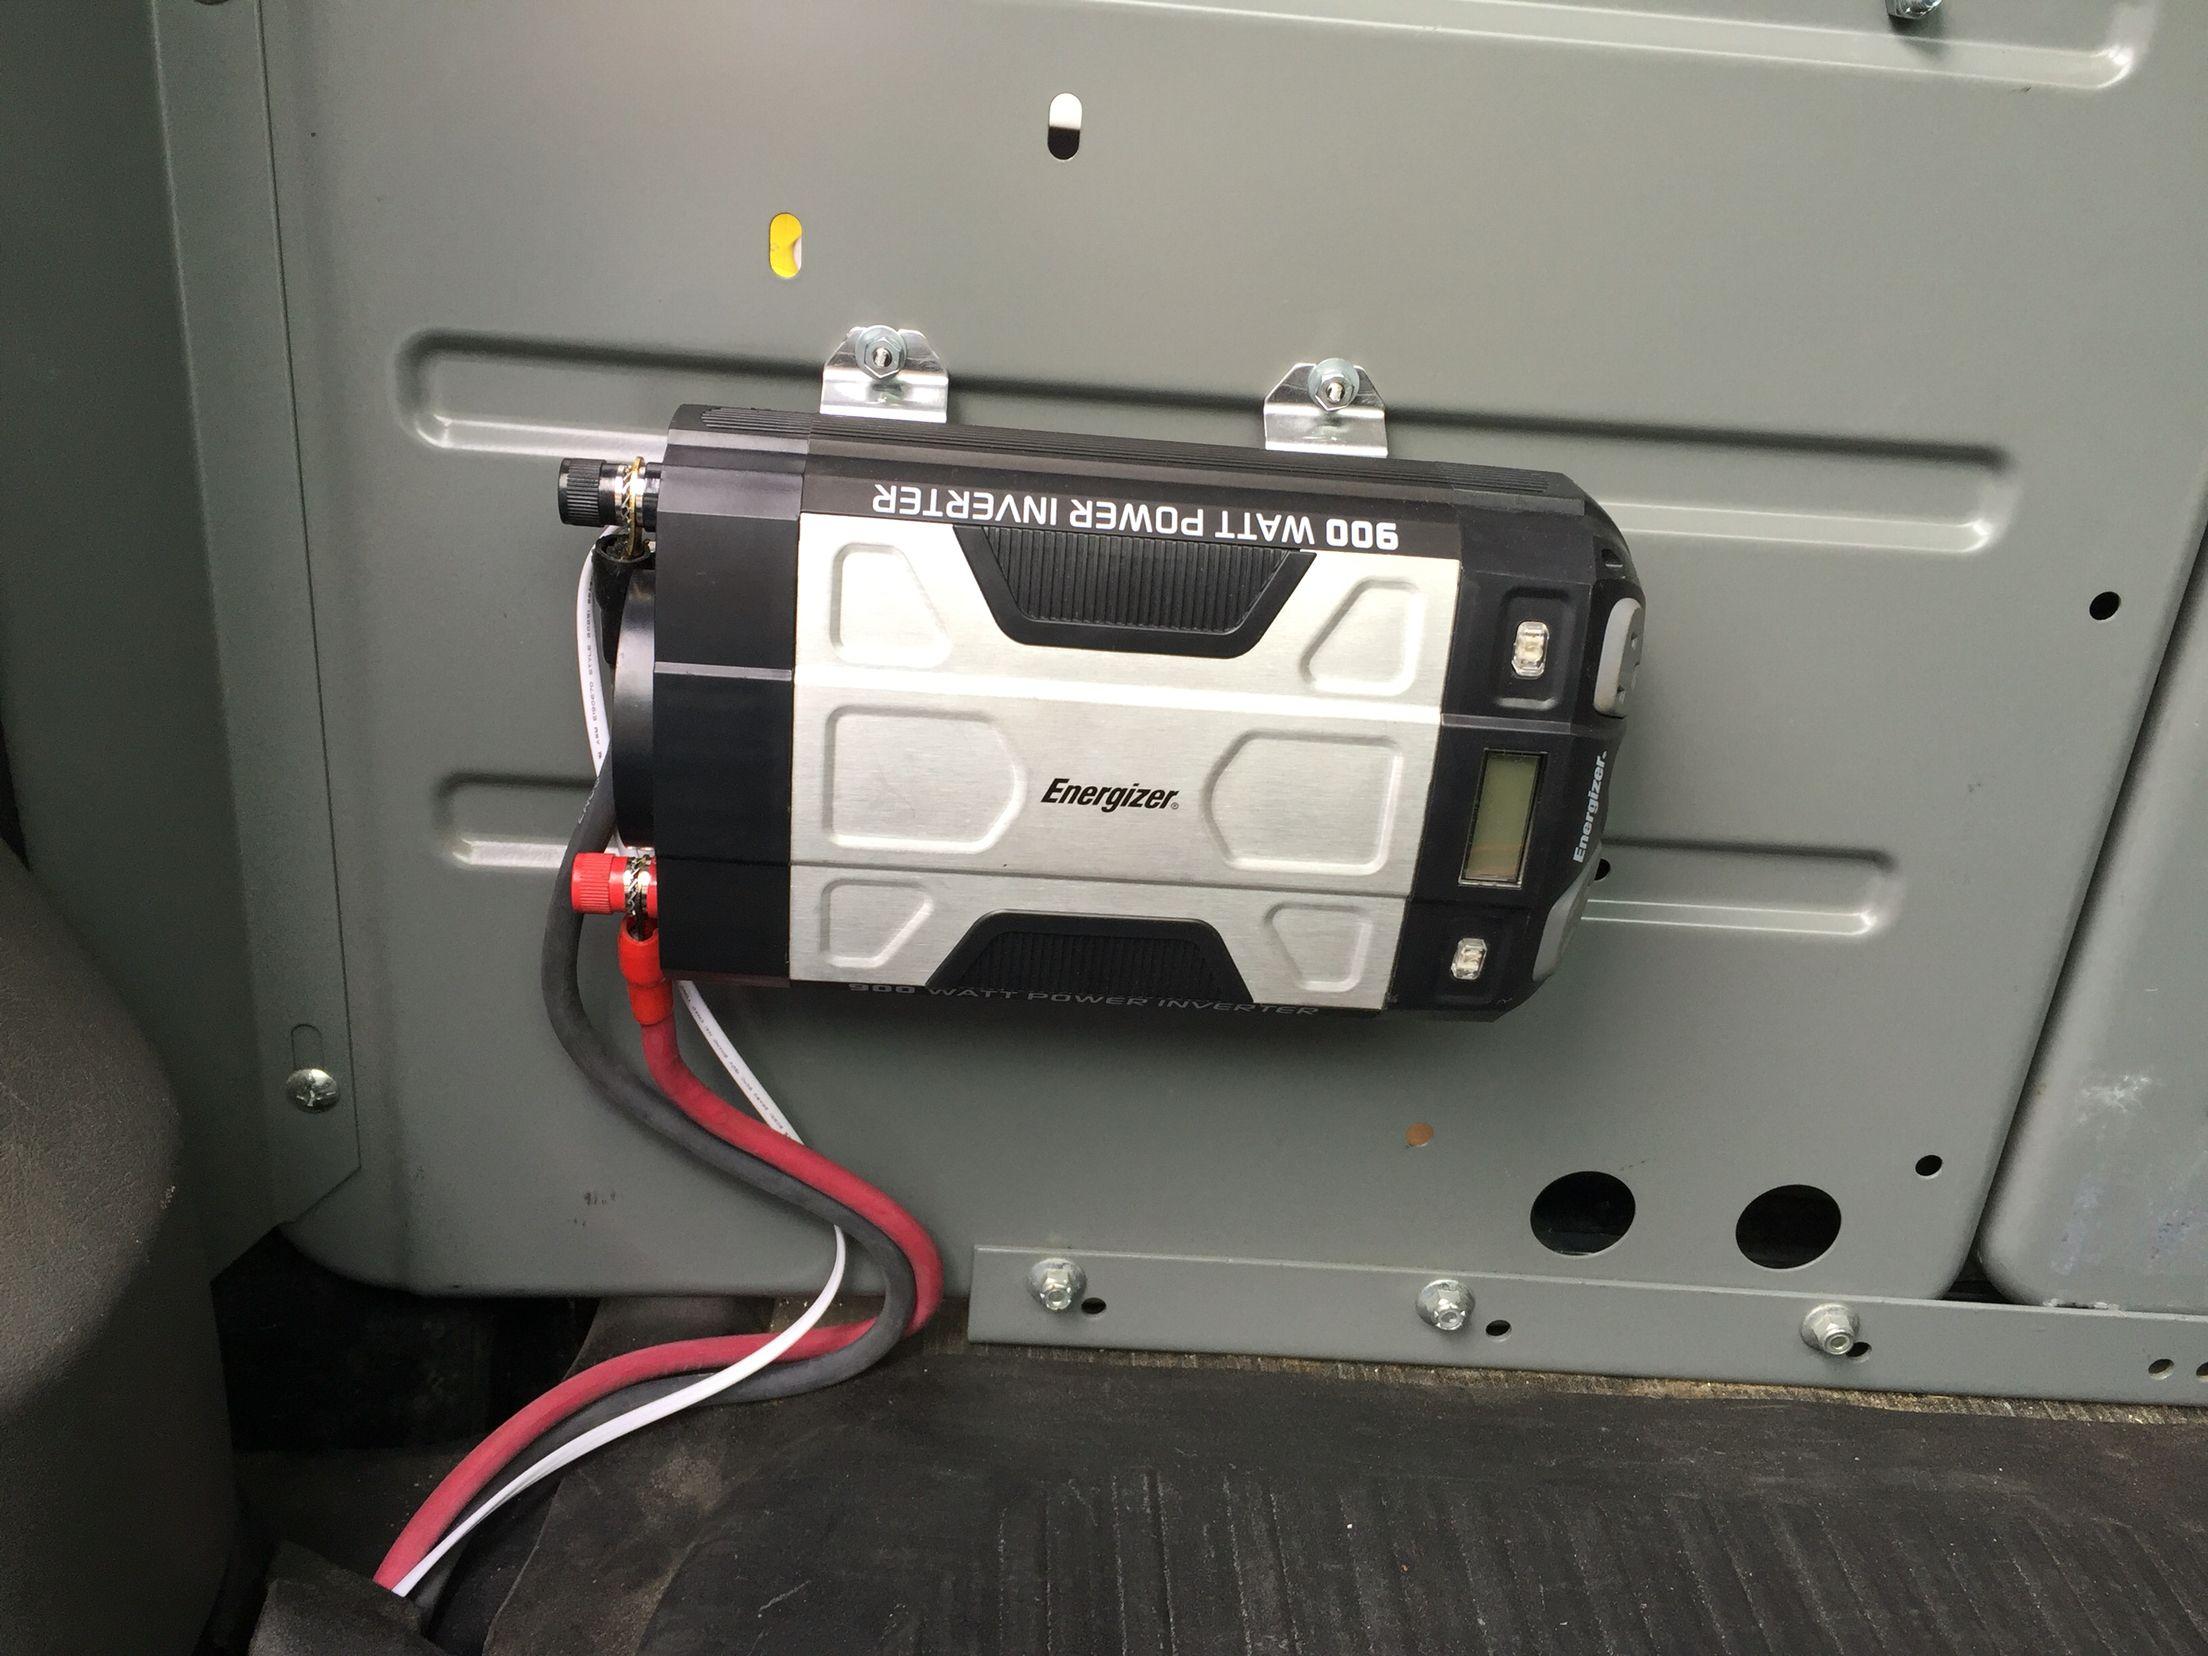 inverter install in my service van used welding cable for the powerinverter install in my service [ 2208 x 1656 Pixel ]